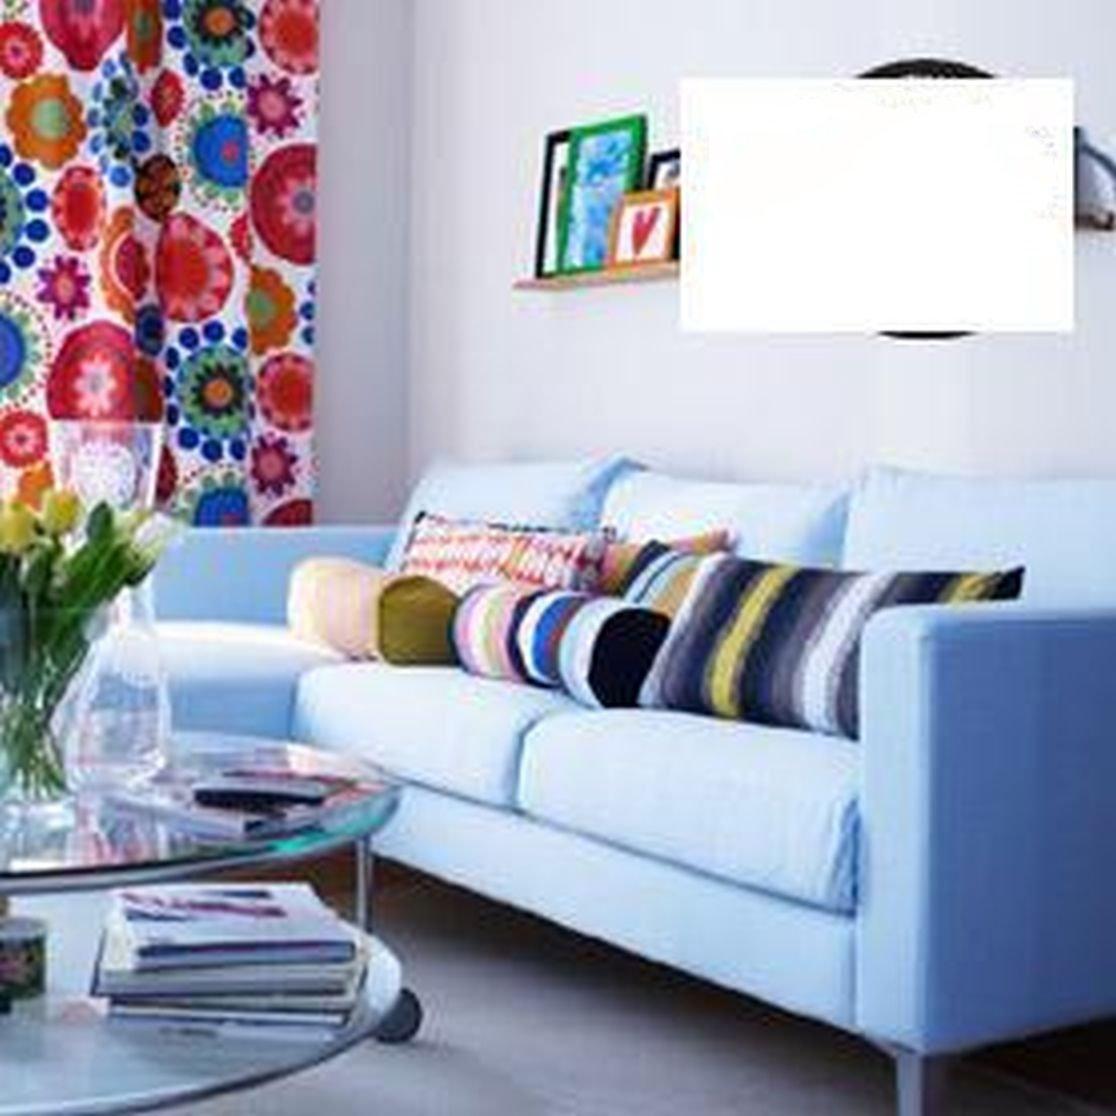 IKEA KARLSTAD Sofa SLIPCOVER Cover SIVIK Light BLUE 3 Seat Mid Century  Modern